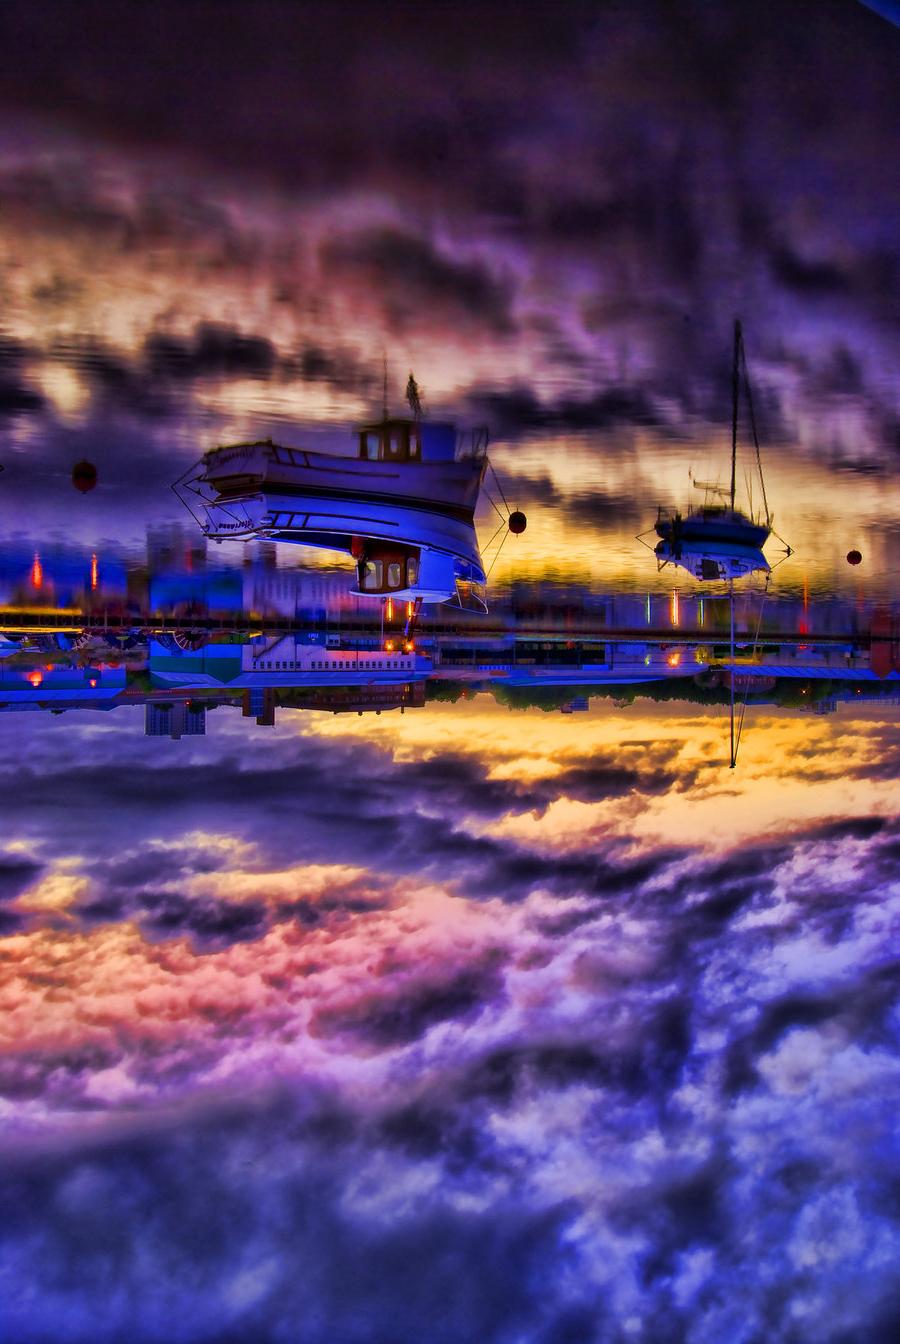 Daydream Boat by AlmightyGingerOne